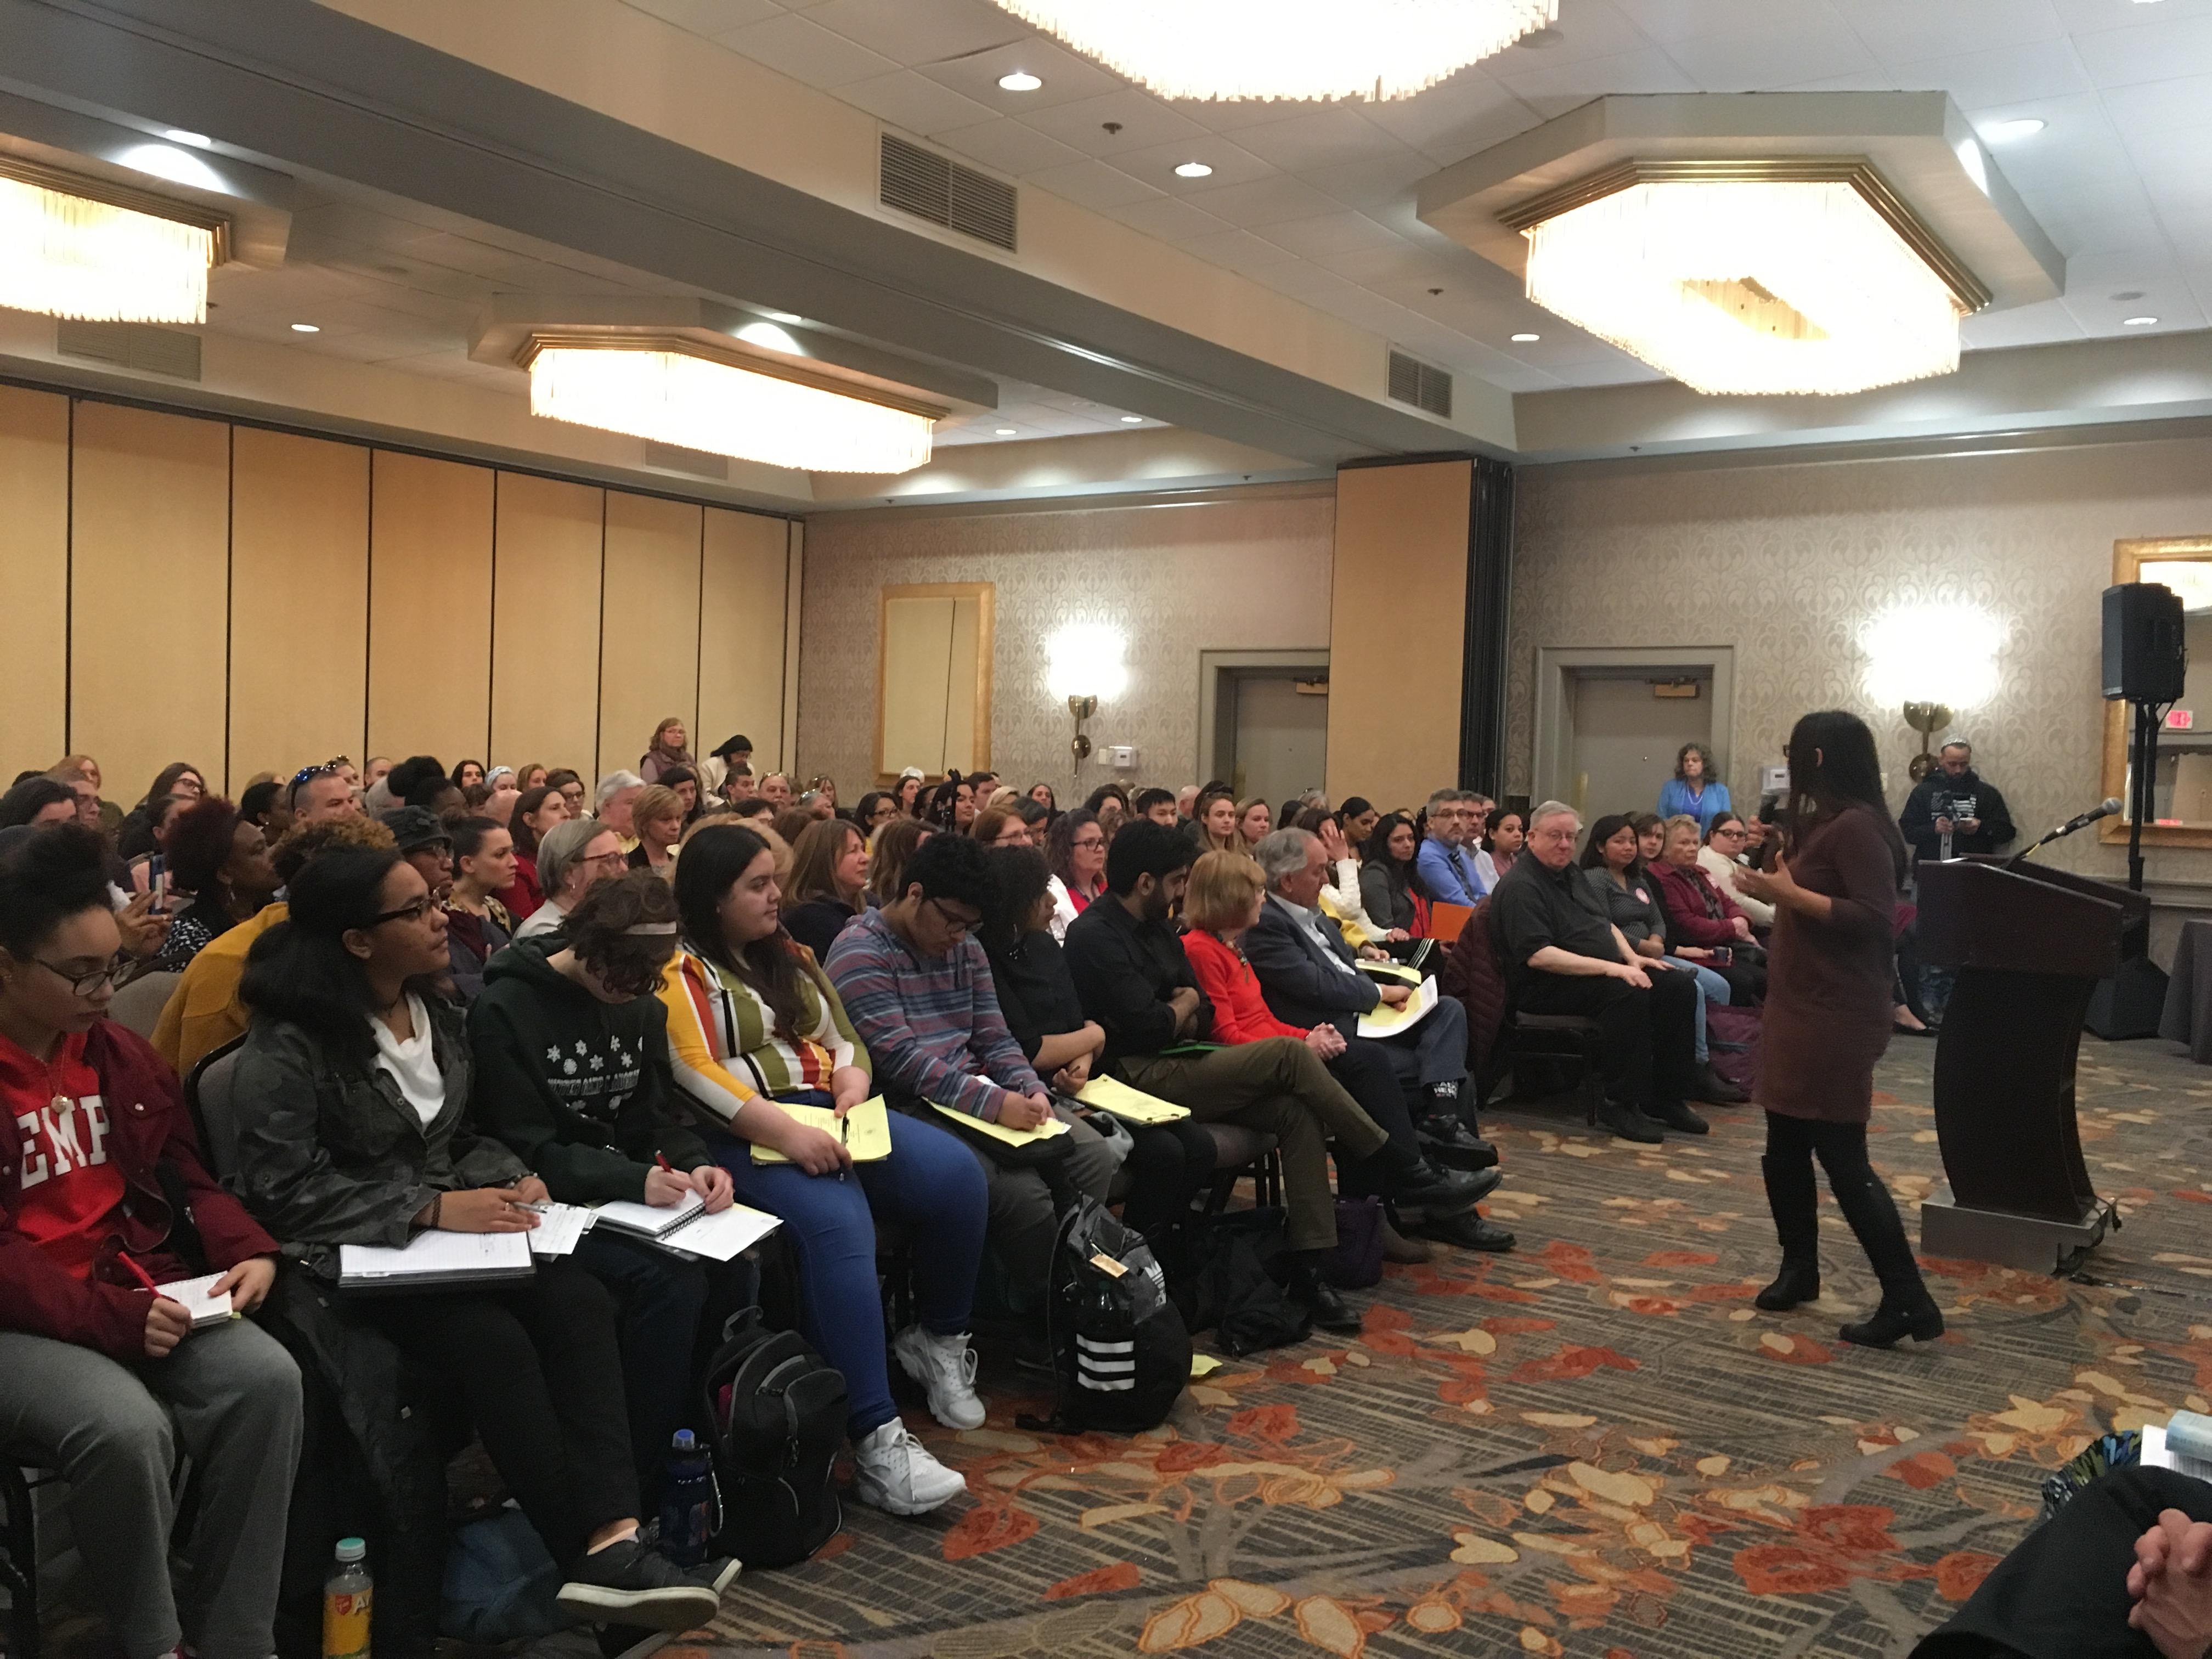 Dr. Mona Hanna-Attisha speaking in Providence, April 11th 2019.